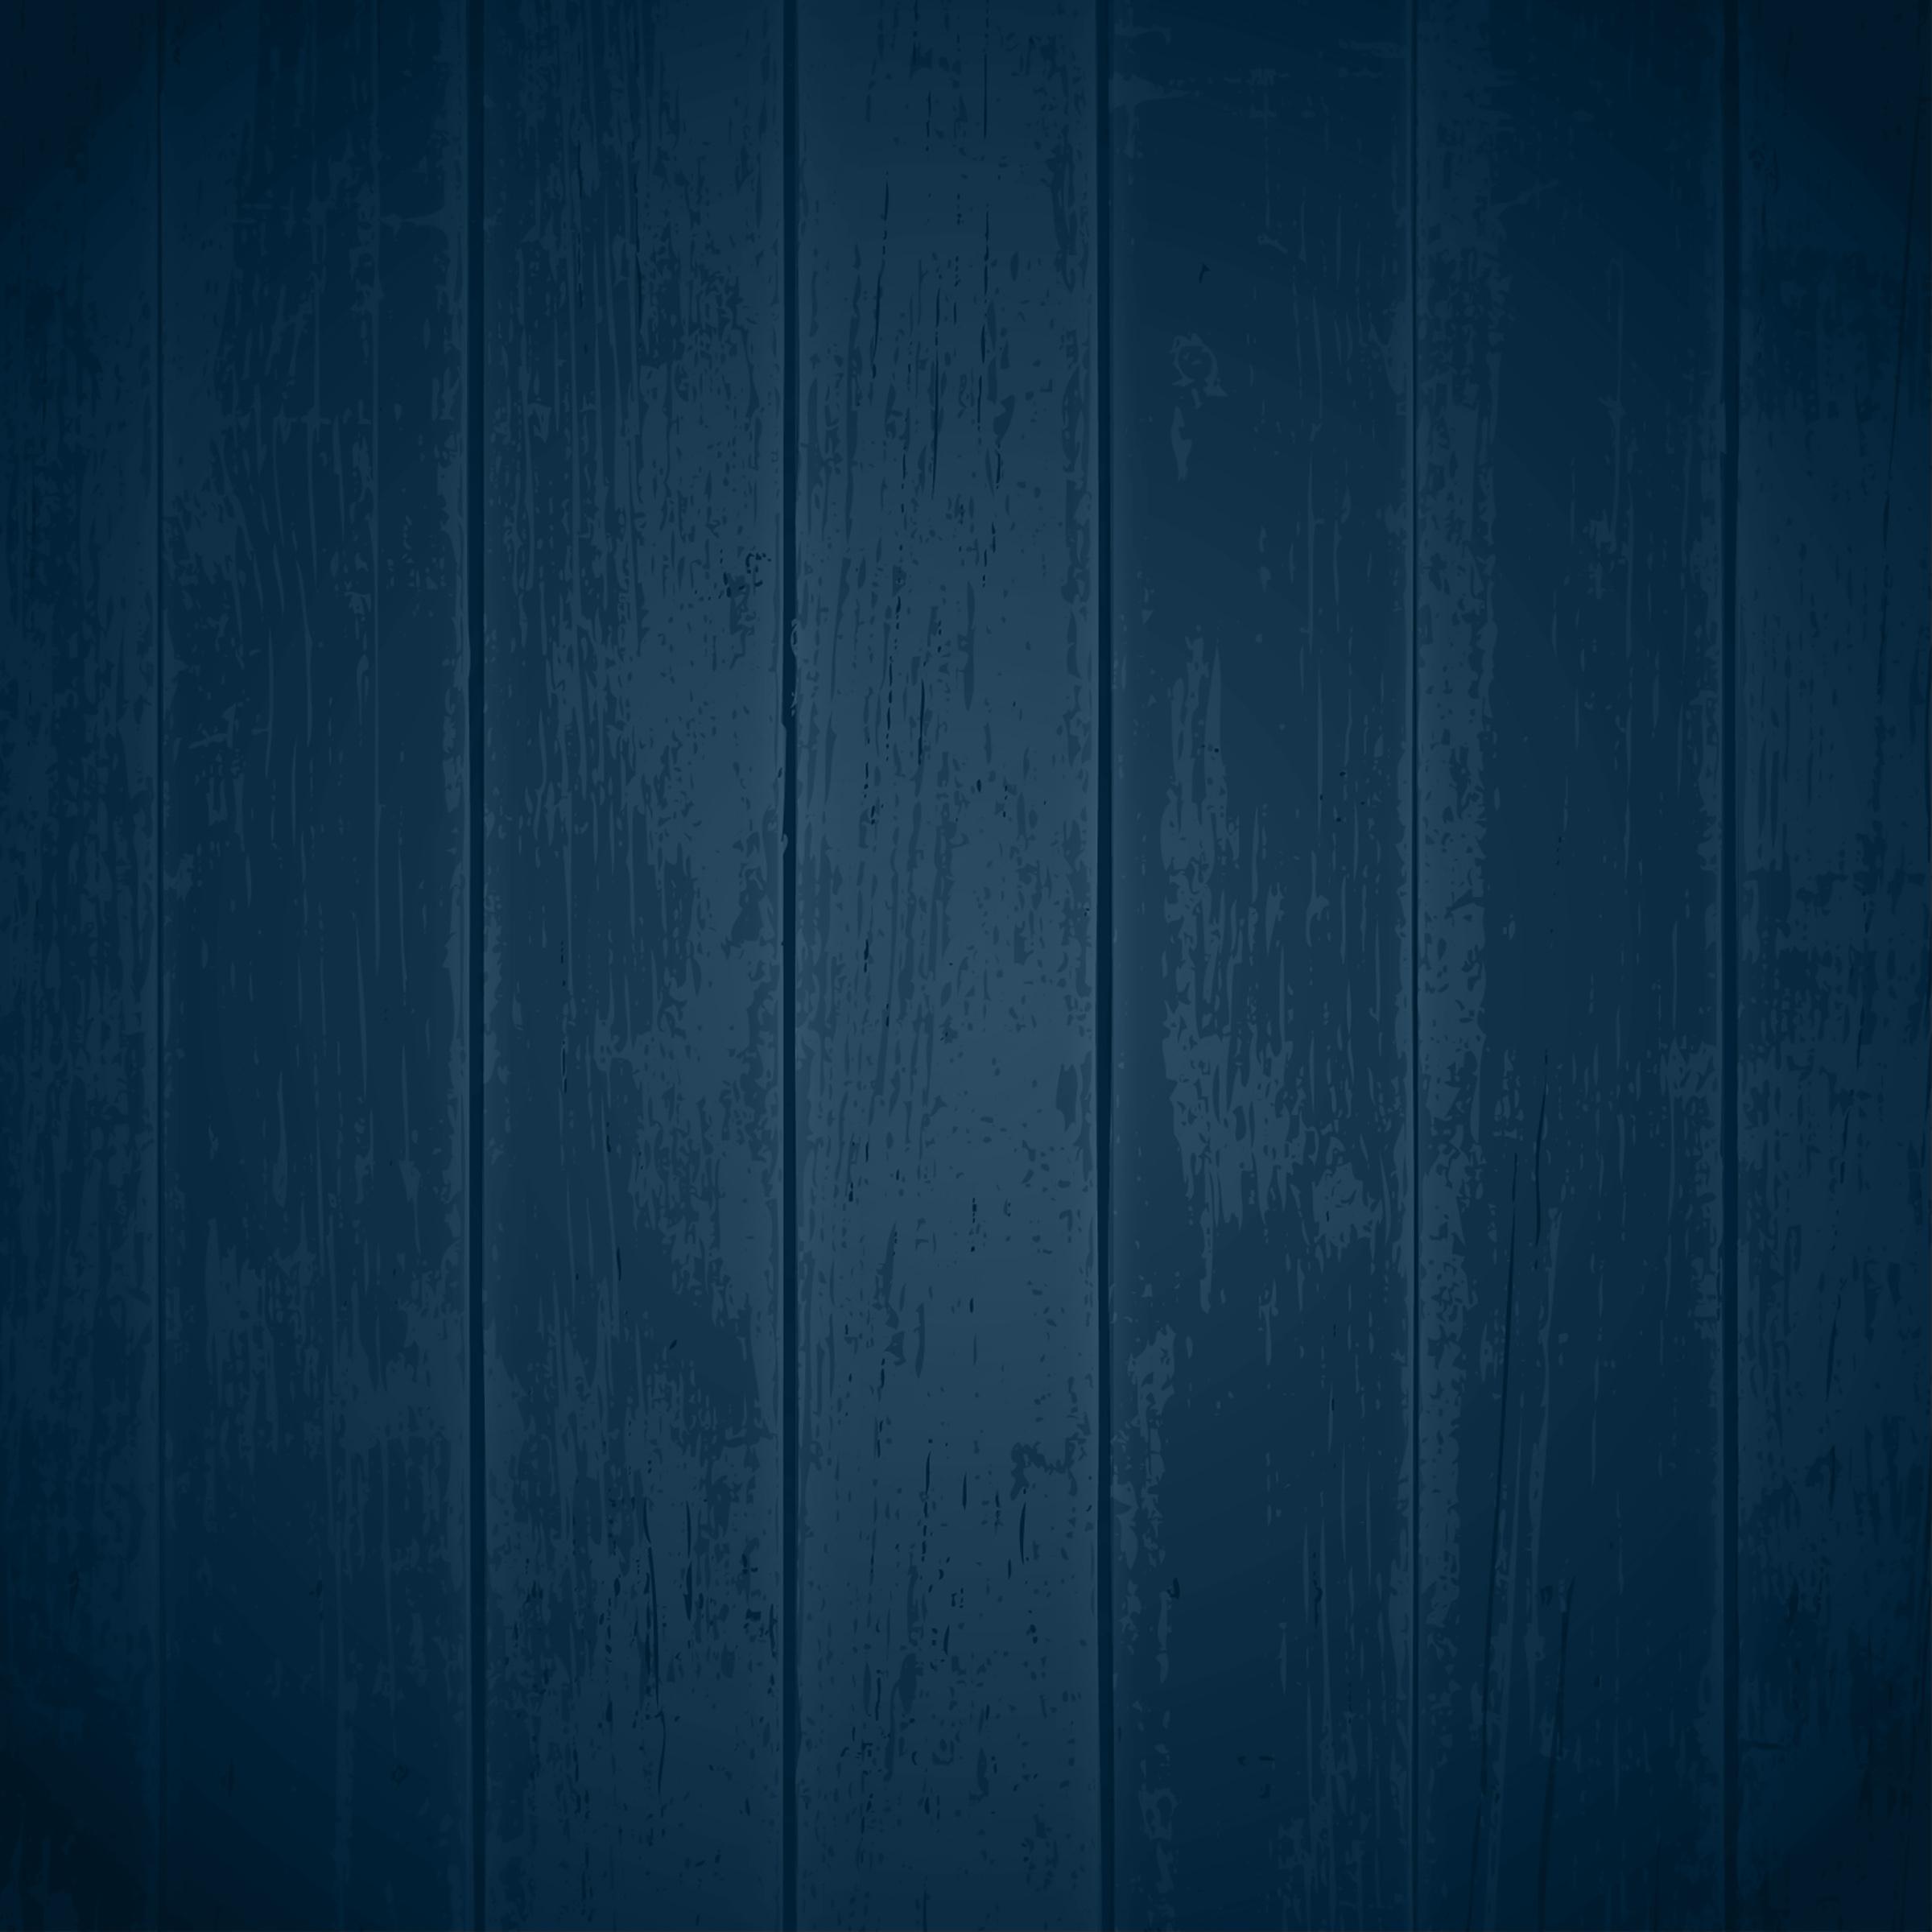 Blue Wood Texture Background Blue Board Grain